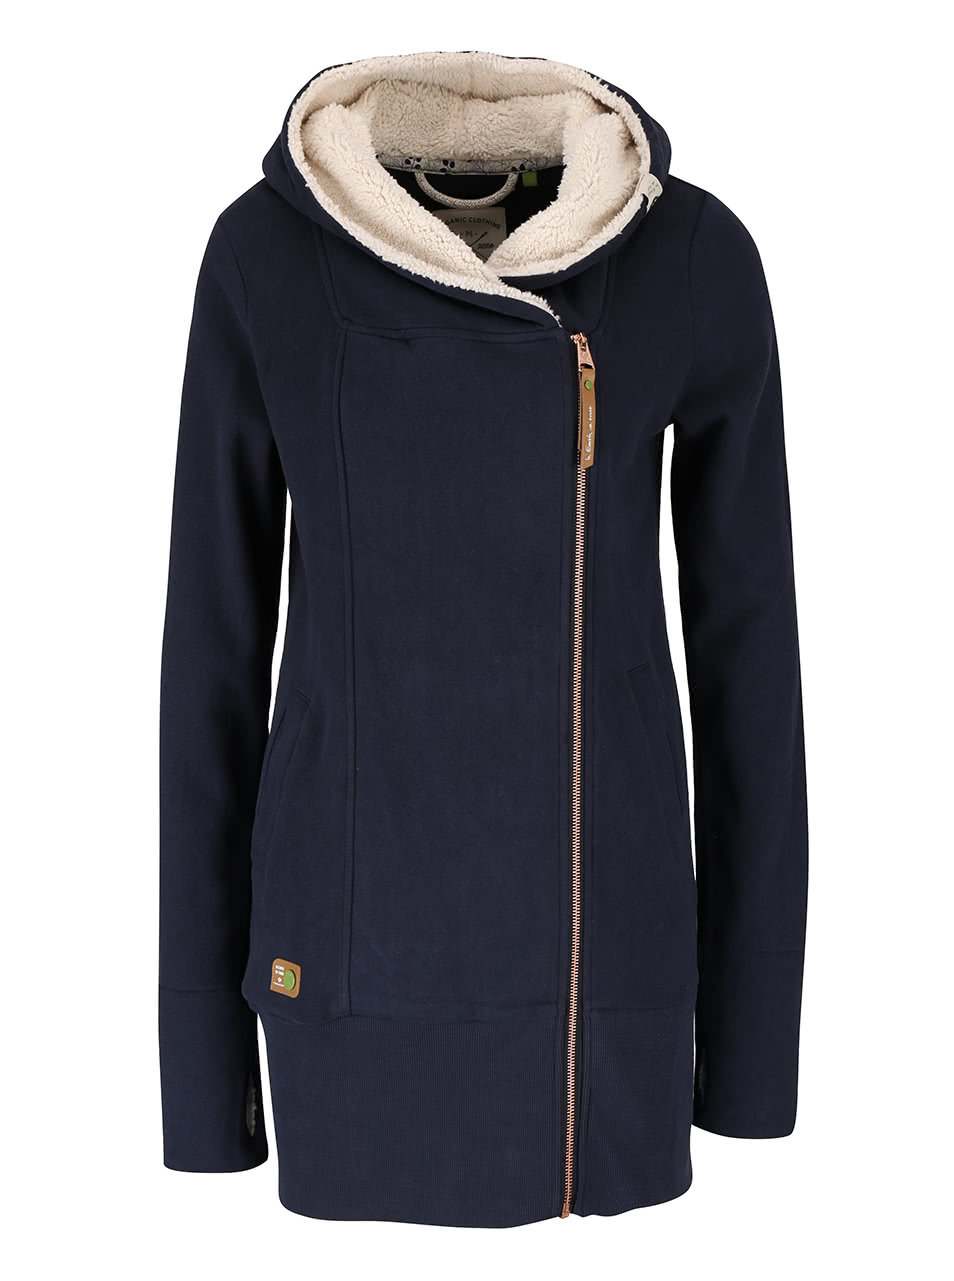 Tmavomodrá dámska dlhá mikina na zips Ragwear Amelia Organic ... 8fdb04da62f